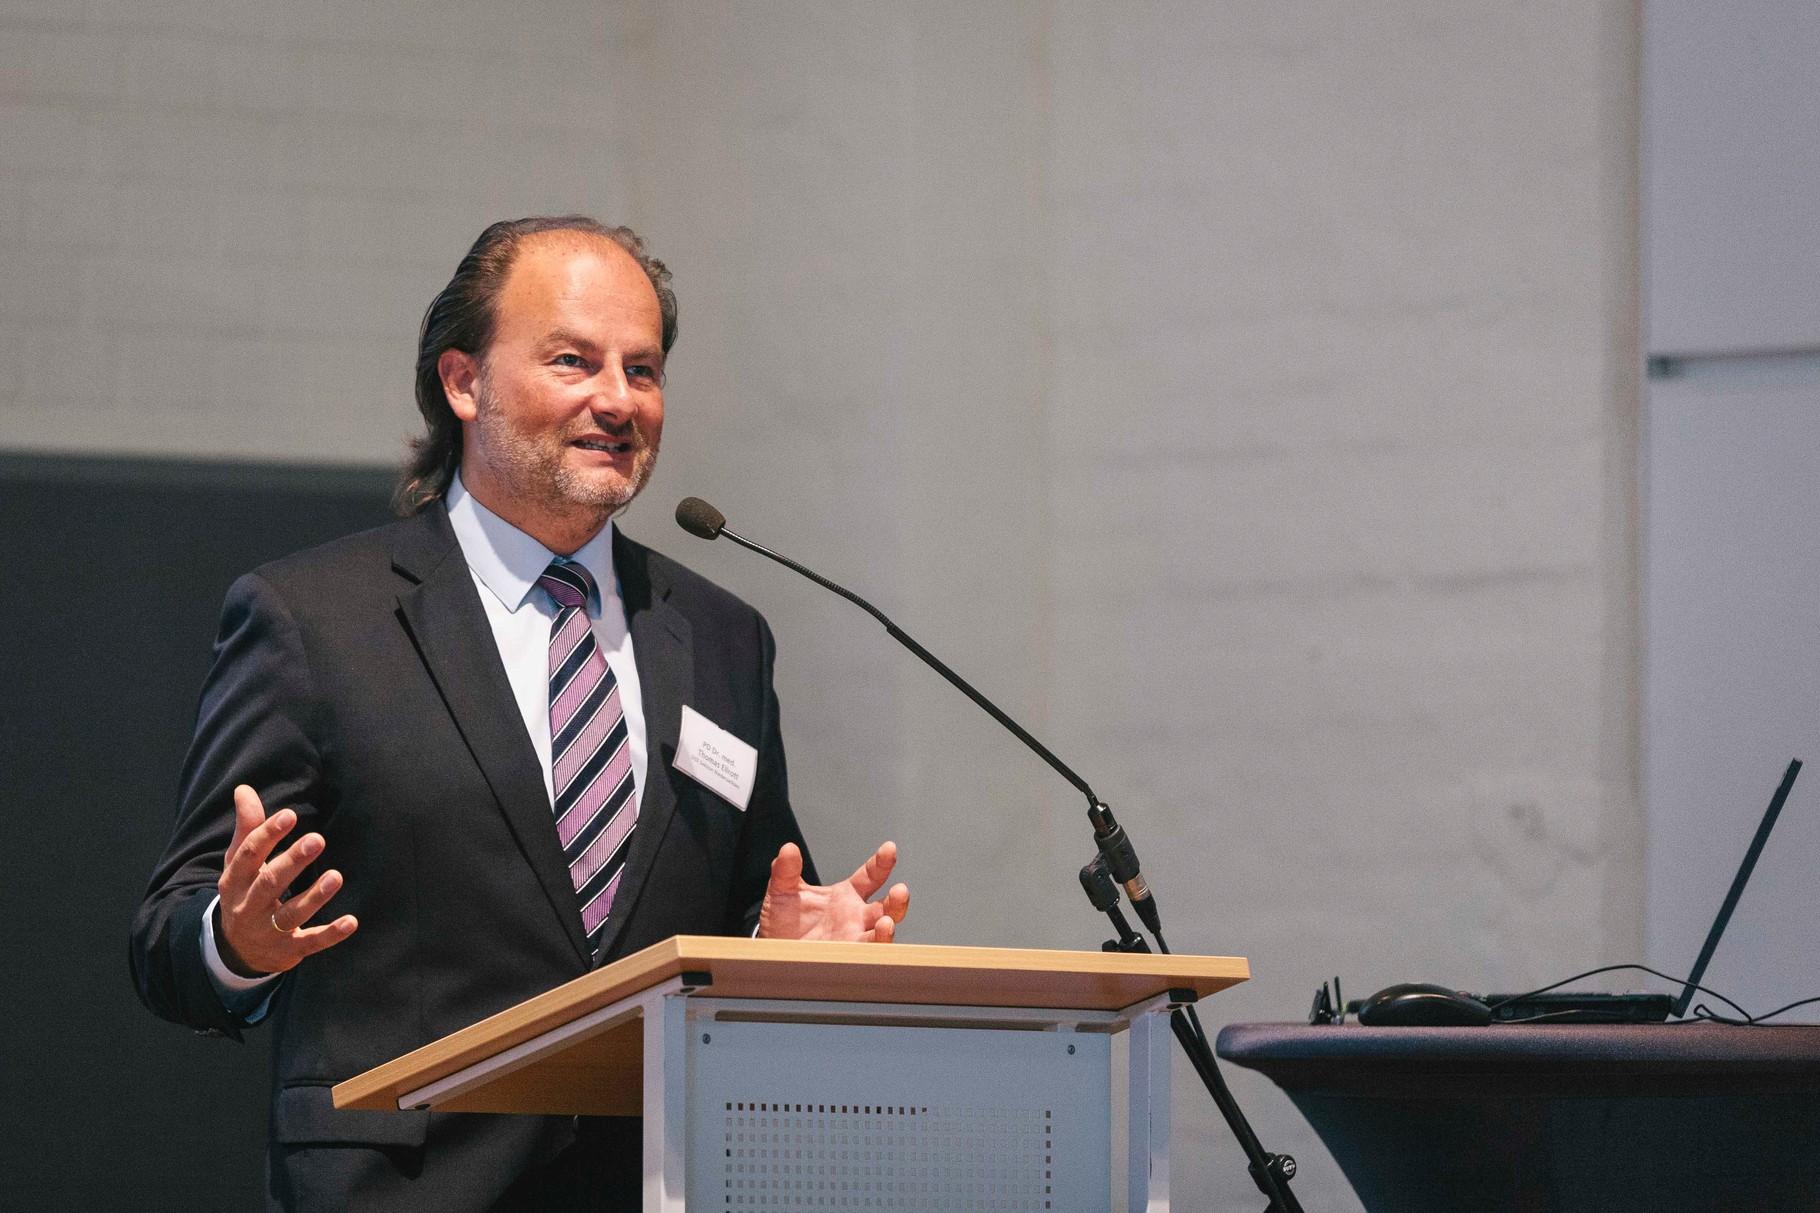 PD Dr. med Thomas Ellrott, Sektionsleiter Deutsche Gesellschaft für Ernährung e. V.